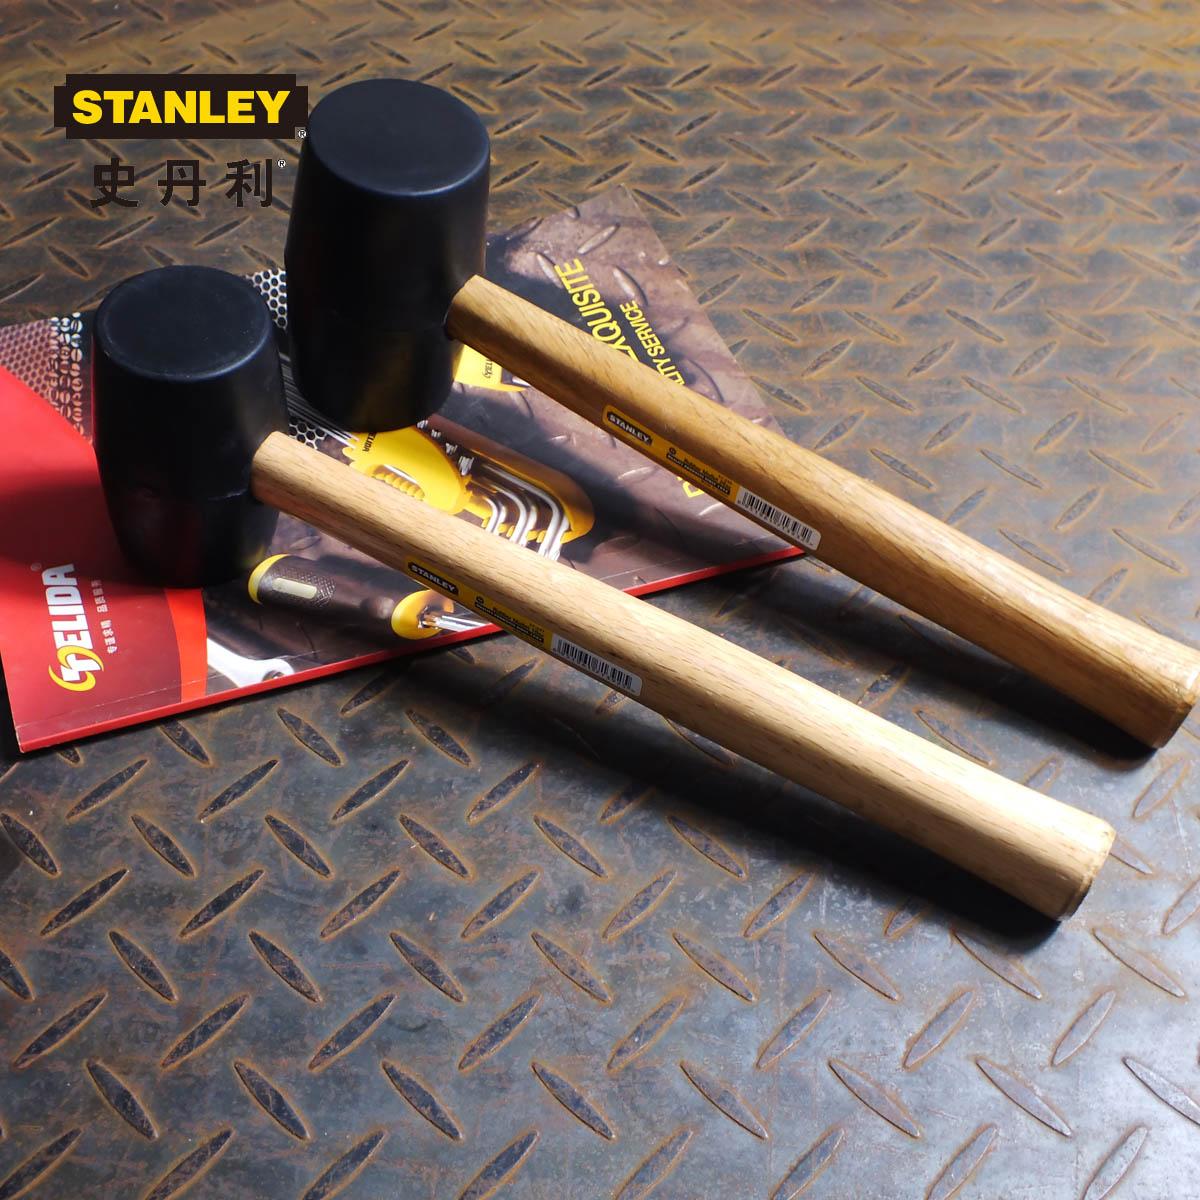 STANLEY 57-527-23 no elastic hammer, rubber hammer, tile mounting hammer, explosion proof hammer